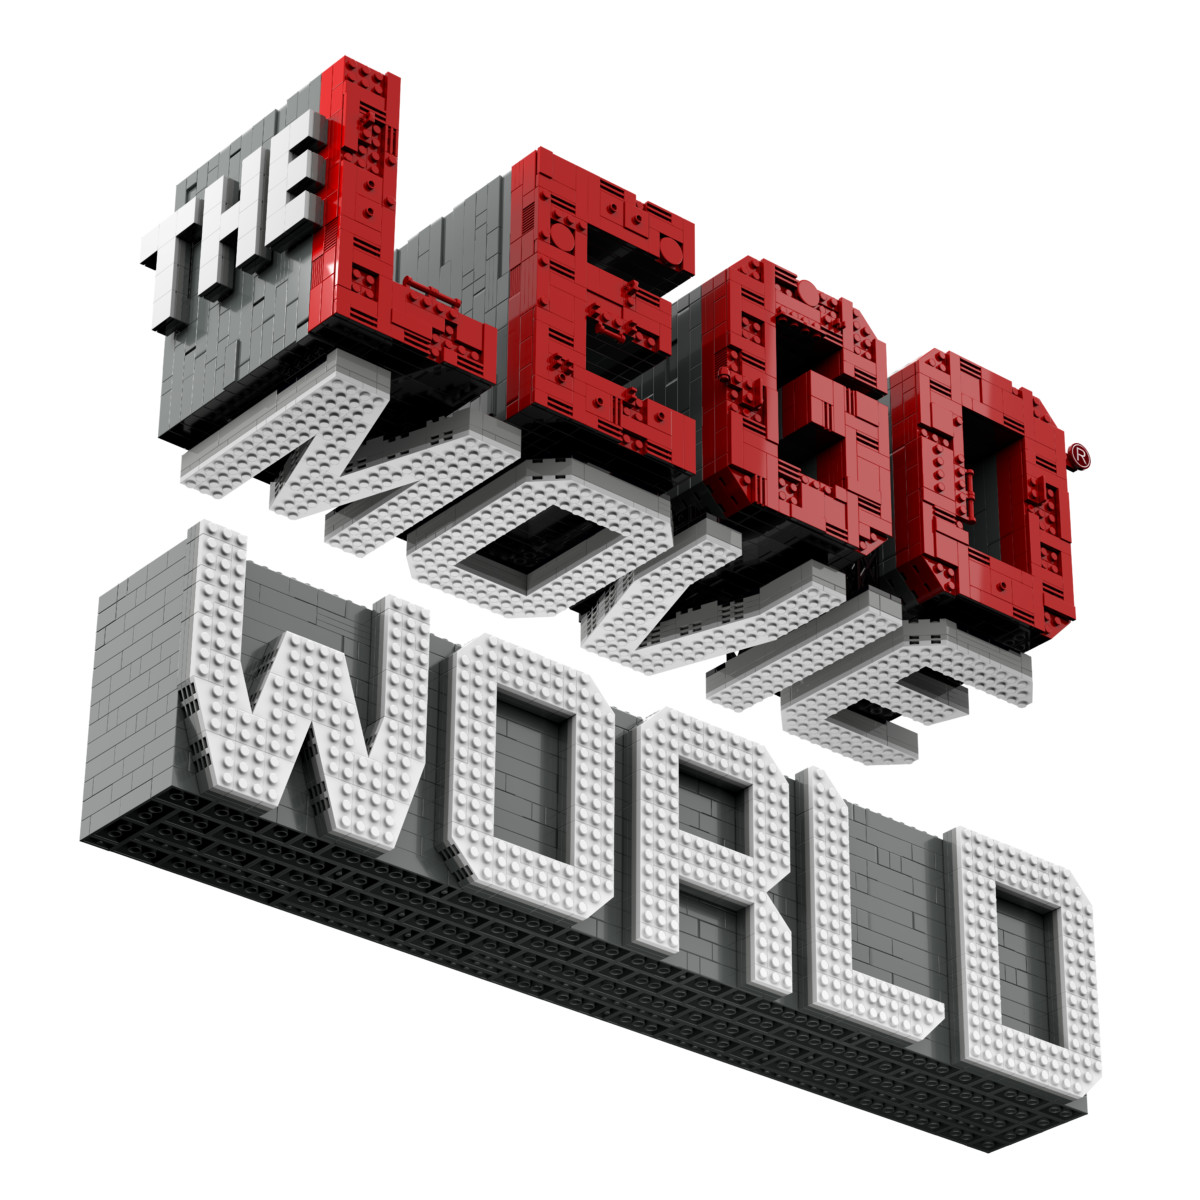 LEGOLAND Florida Resort Announces Its Biggest Theme Park Investment Yet: THE LEGO MOVIE WORLD 2